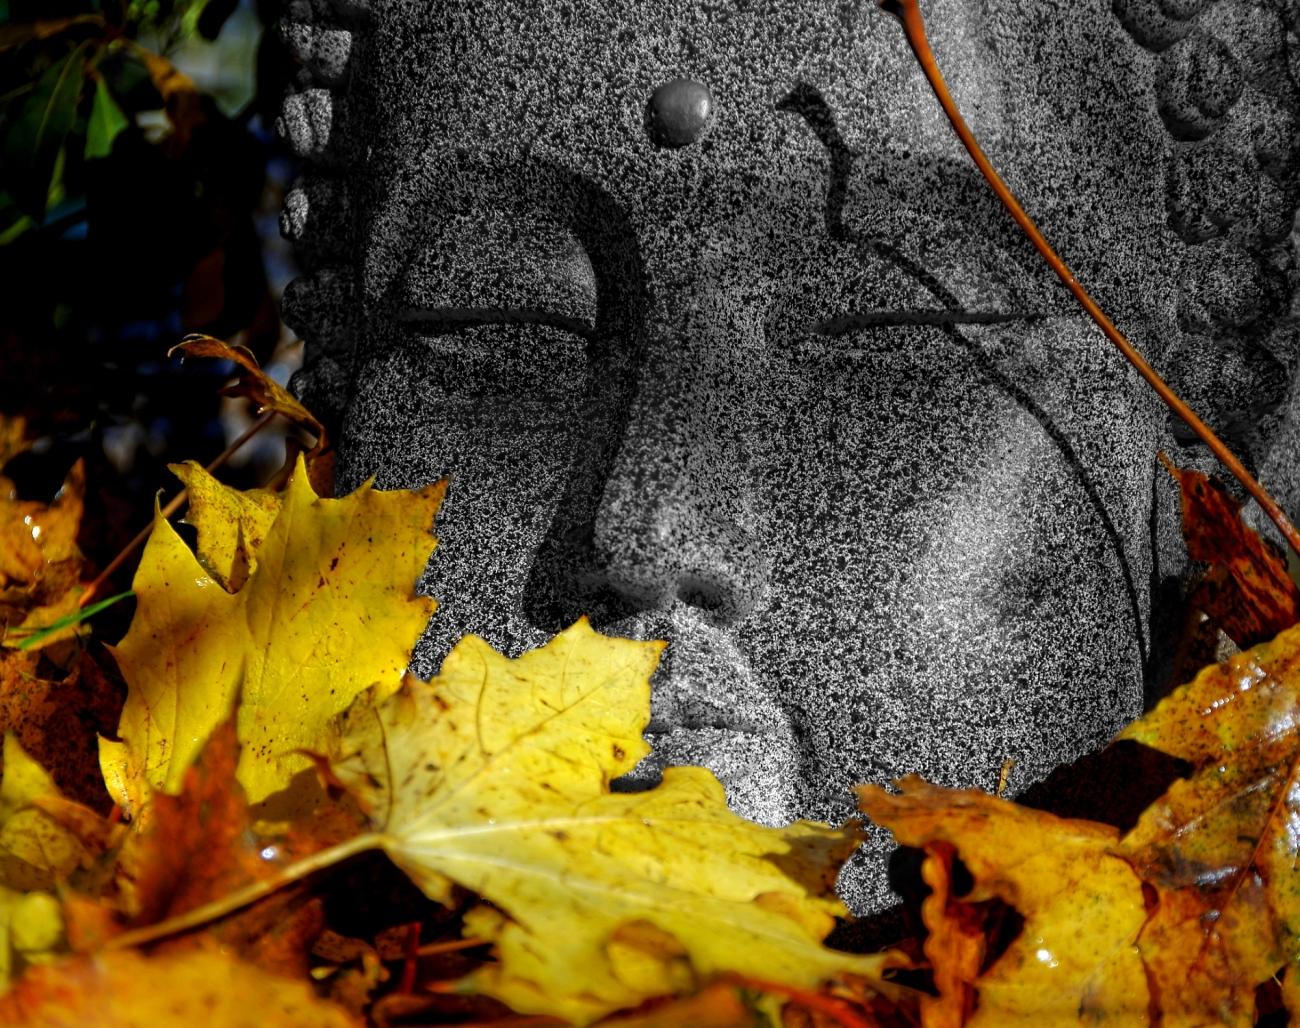 Bouddha, feuilles, automne, nature morte